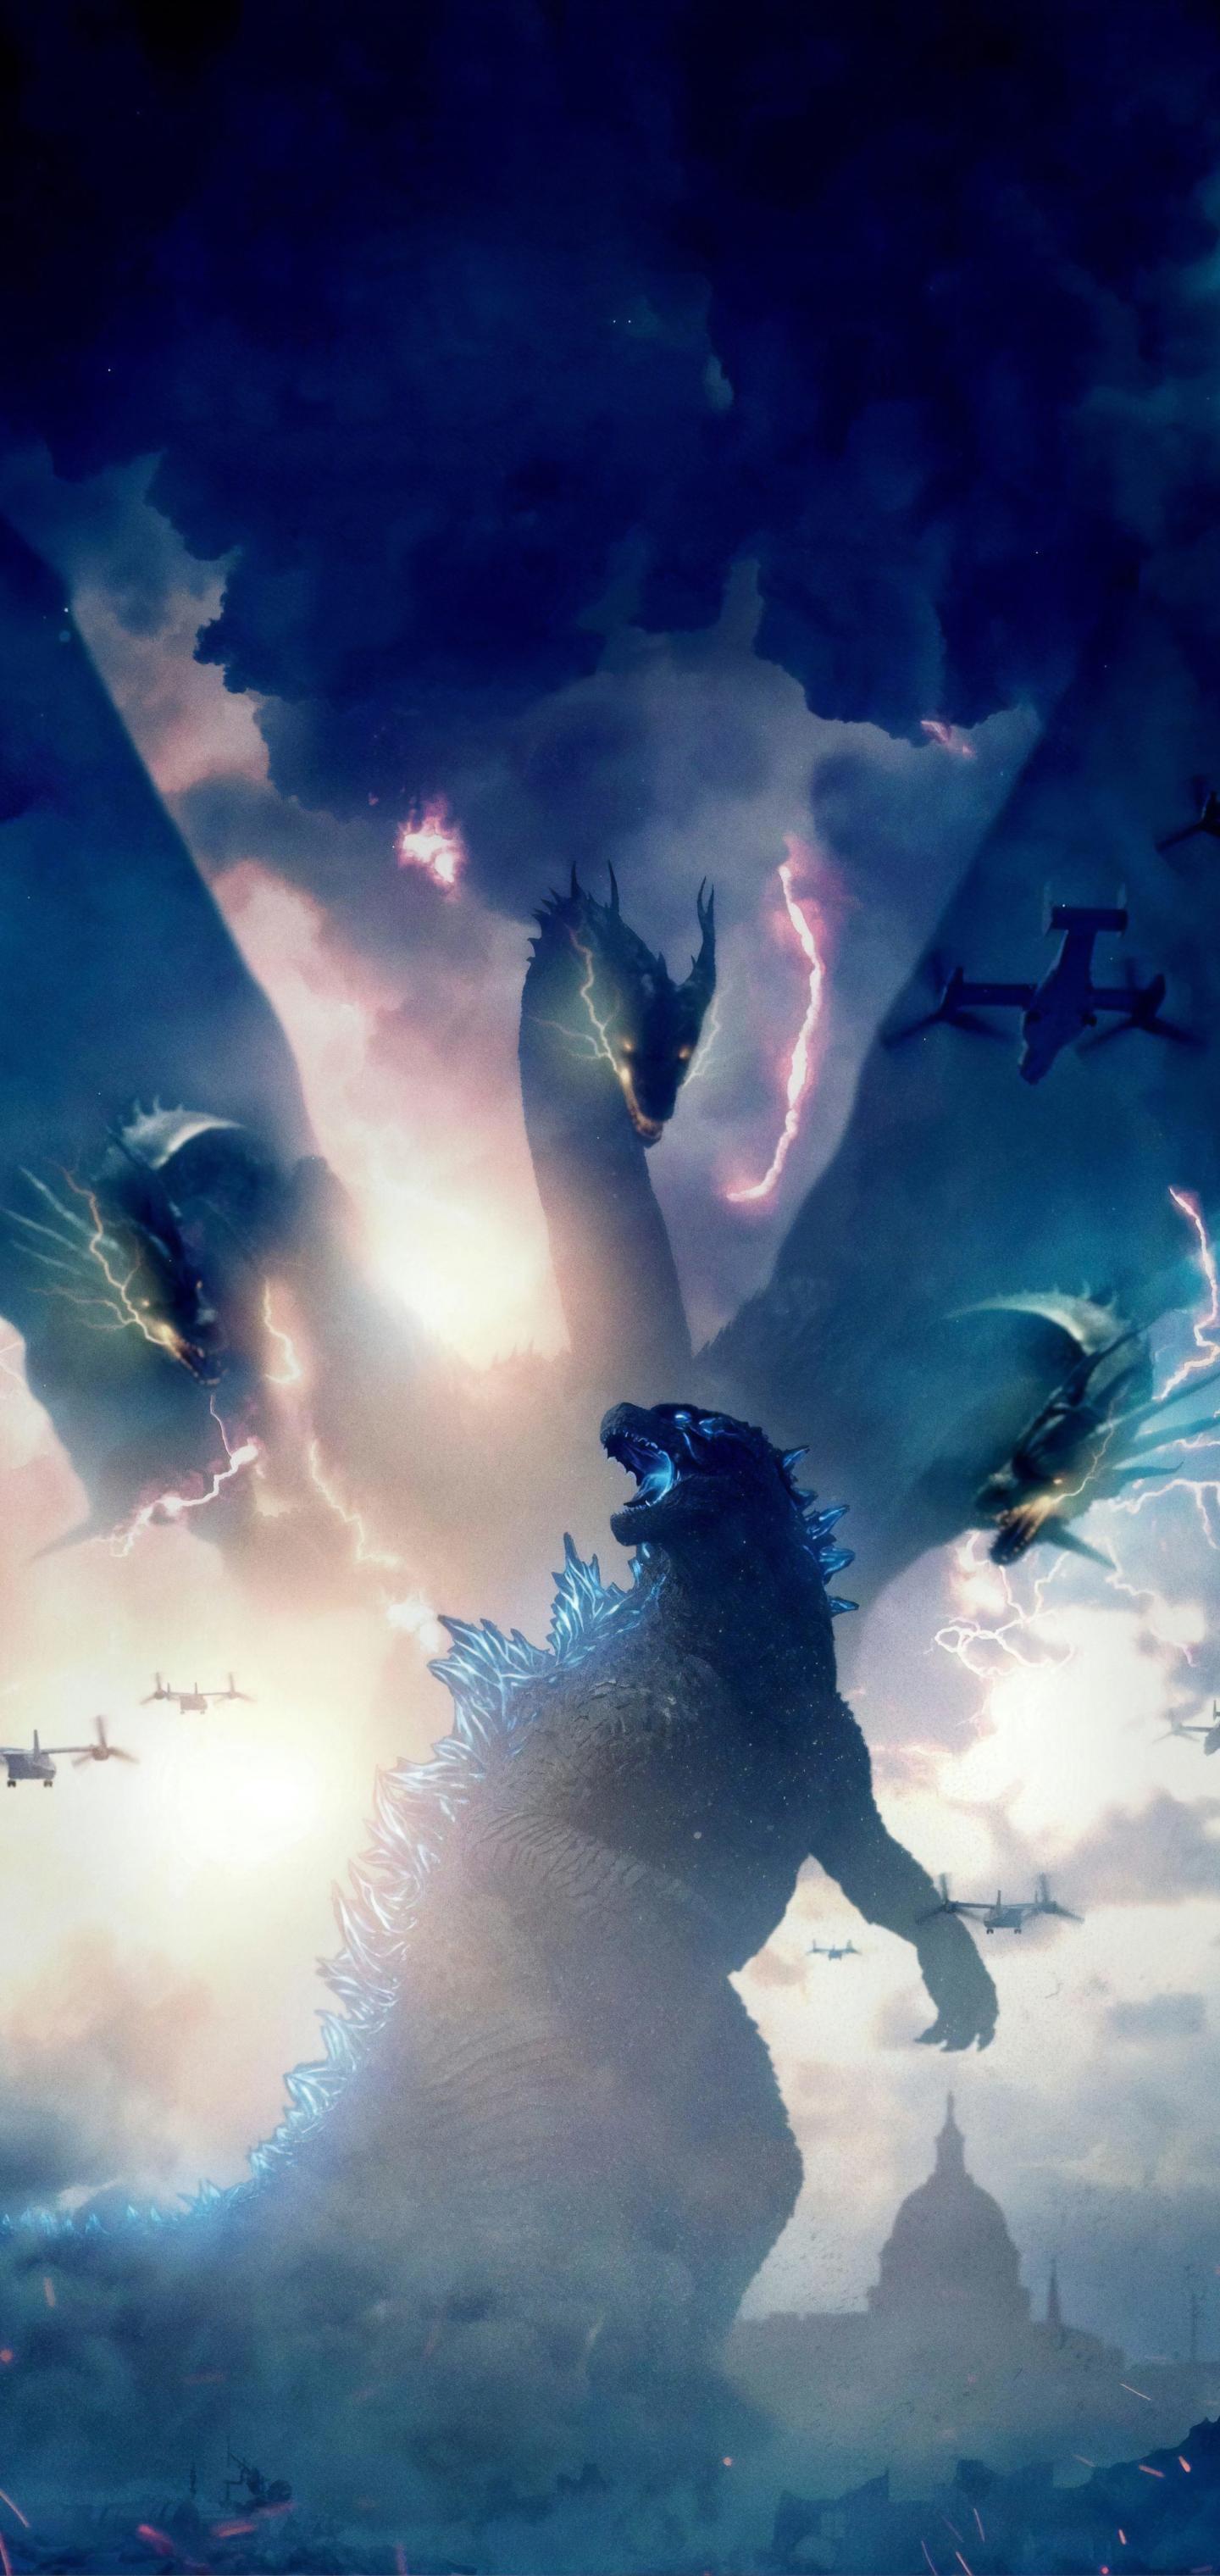 1440x3040 Godzilla King Of The Monsters Movie 2019 1440x3040